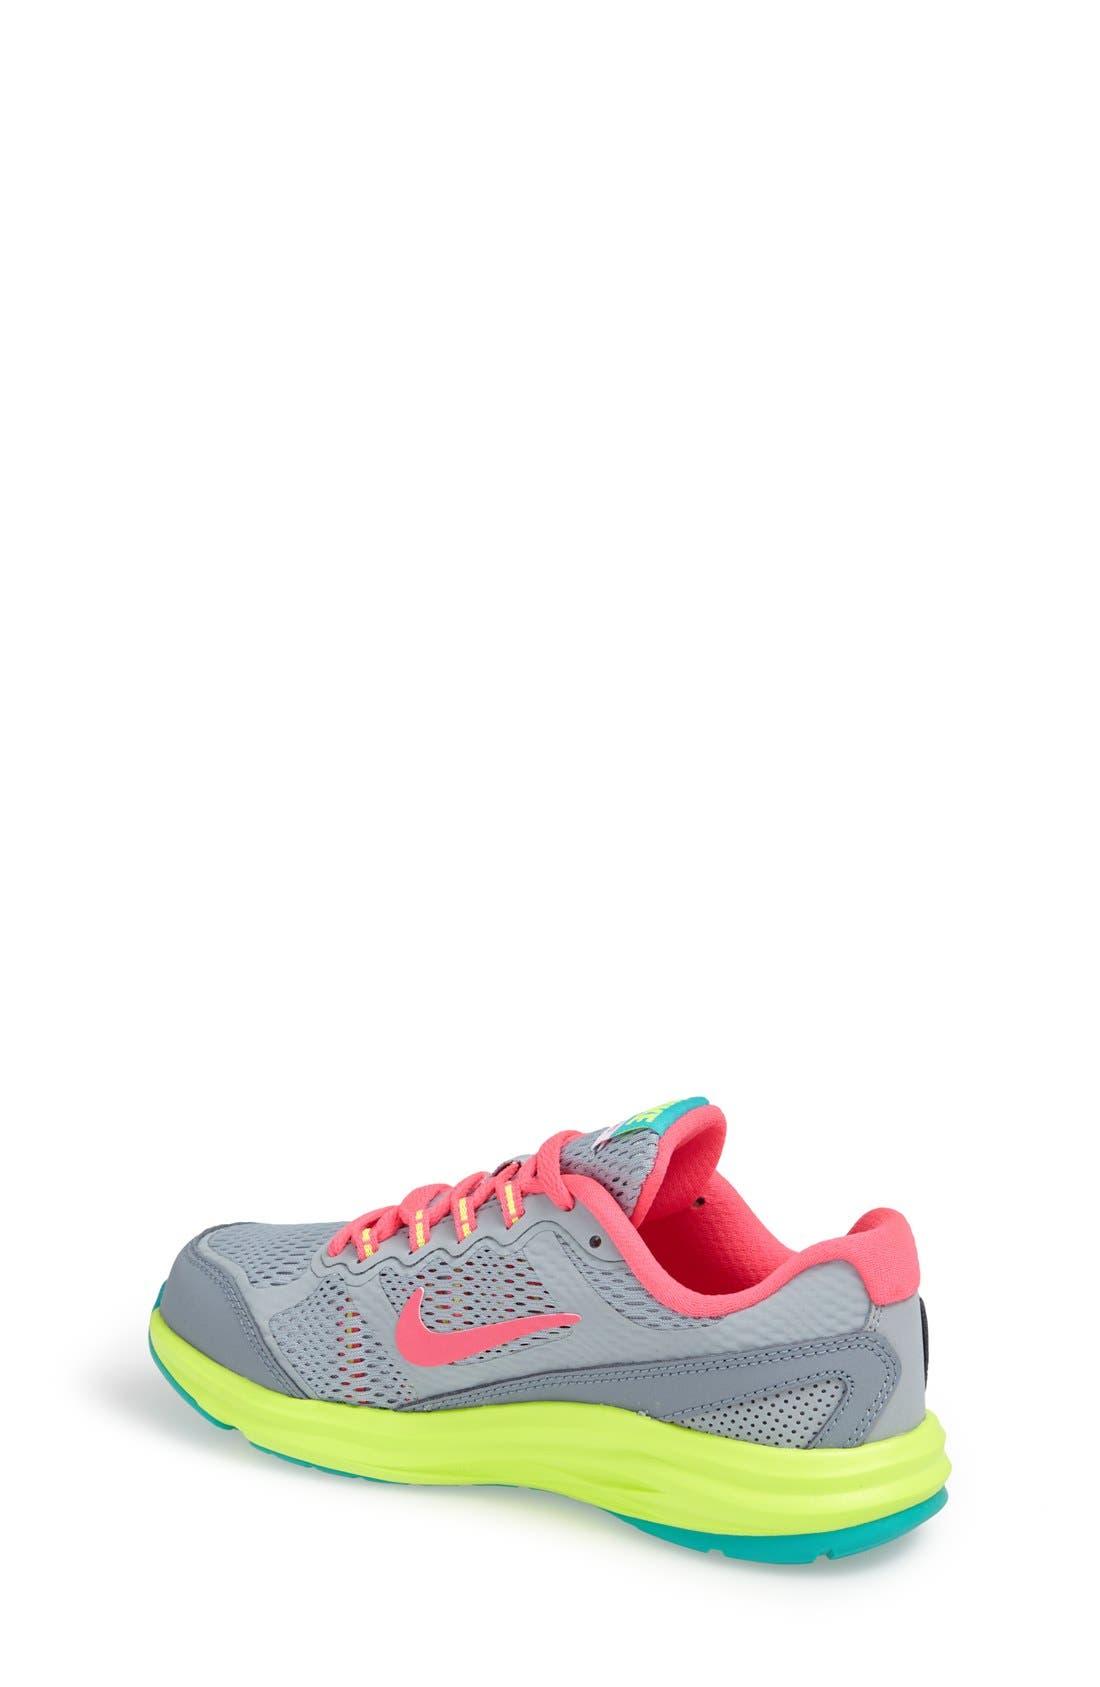 Alternate Image 2  - Nike 'Dual Fusion Run' Athletic Shoe (Toddler & Little Kid)